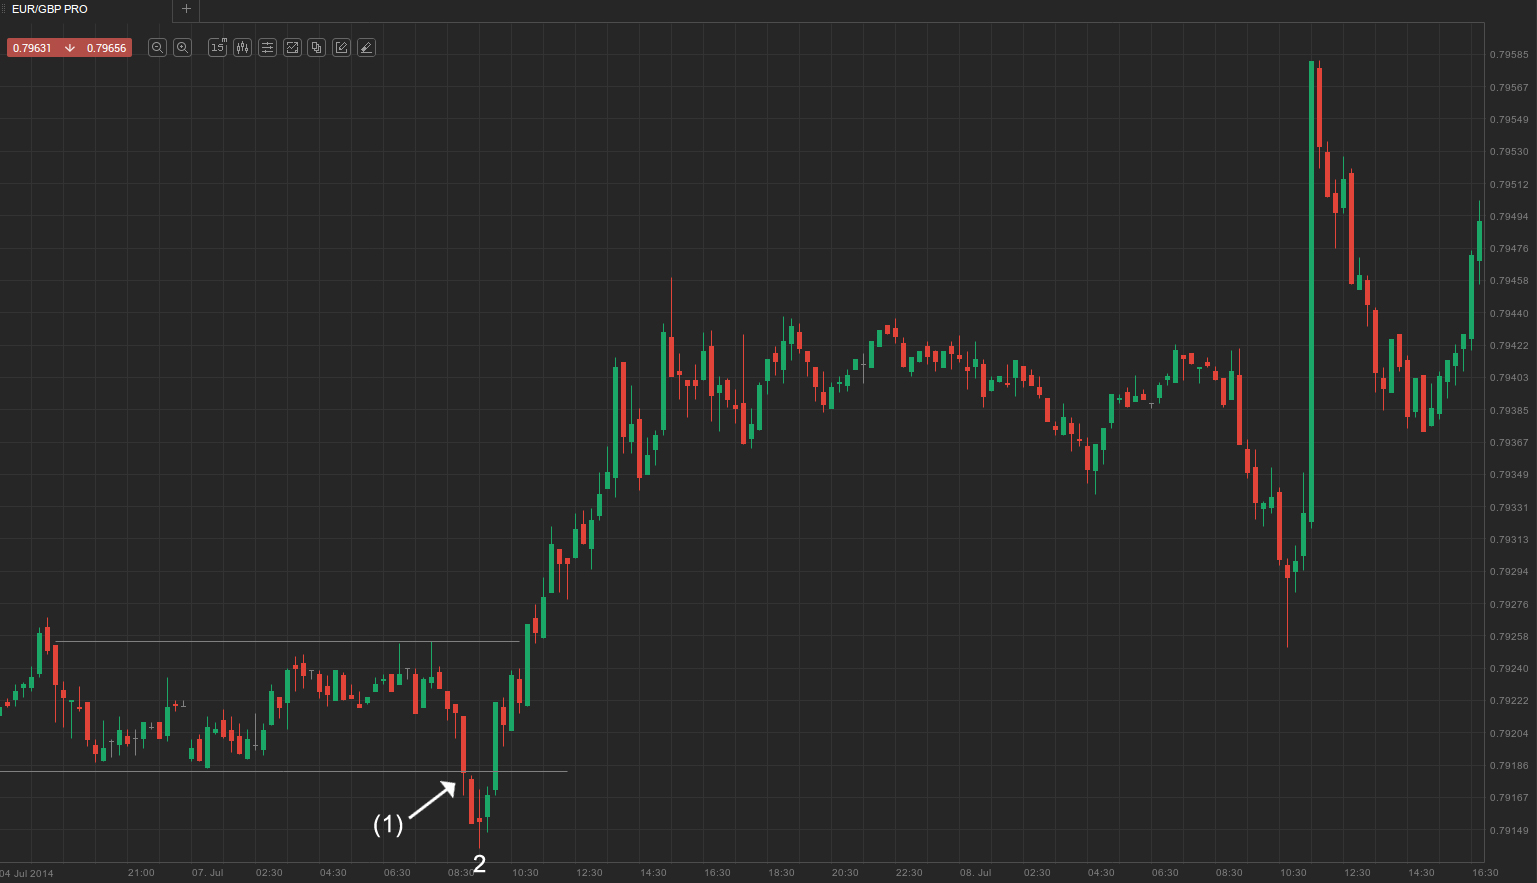 EUR--GBP failed breakout